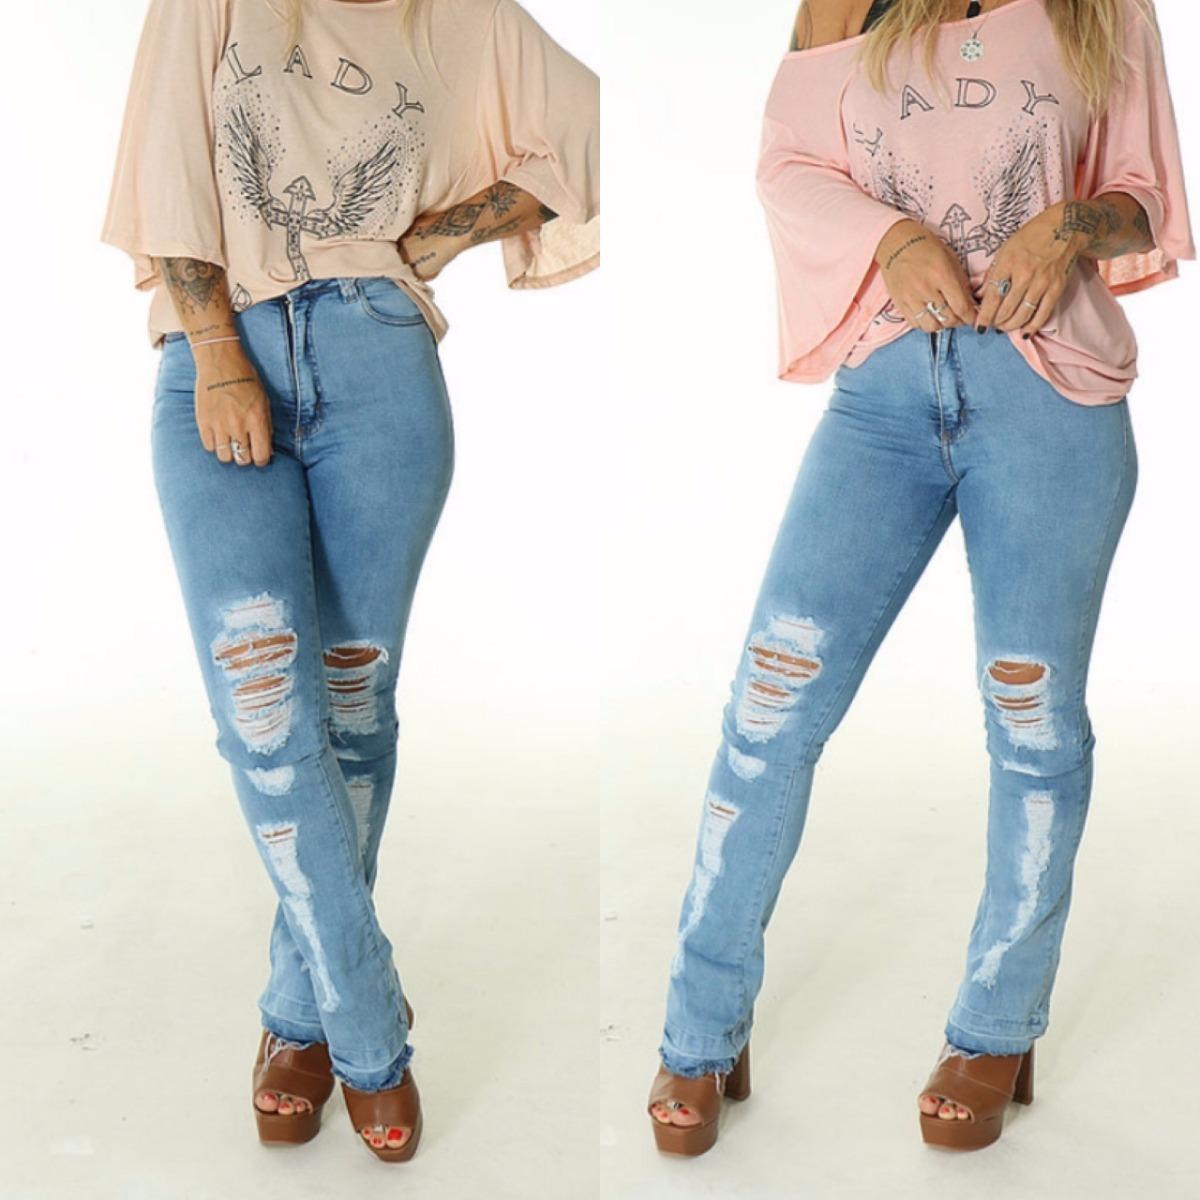 2dca92e02 Características. Marca Lady Rock; Modelo Flare; Gênero Feminino; Material  da calça Jean